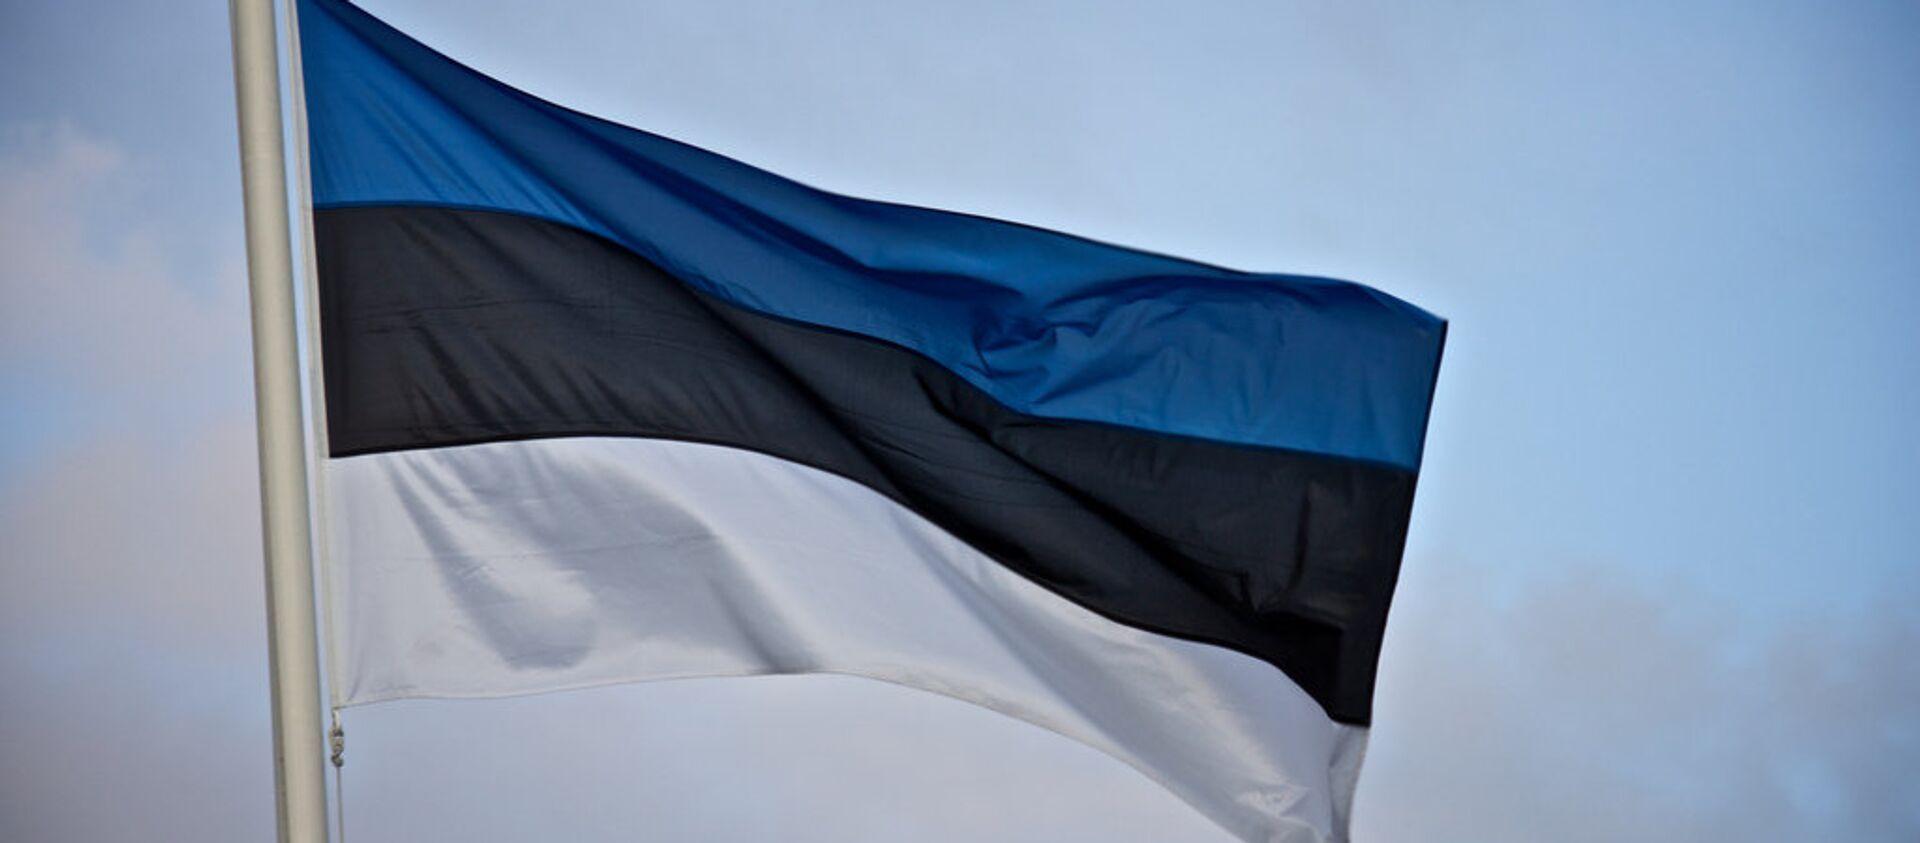 Сцяг Эстоніі - Sputnik Беларусь, 1920, 07.04.2021